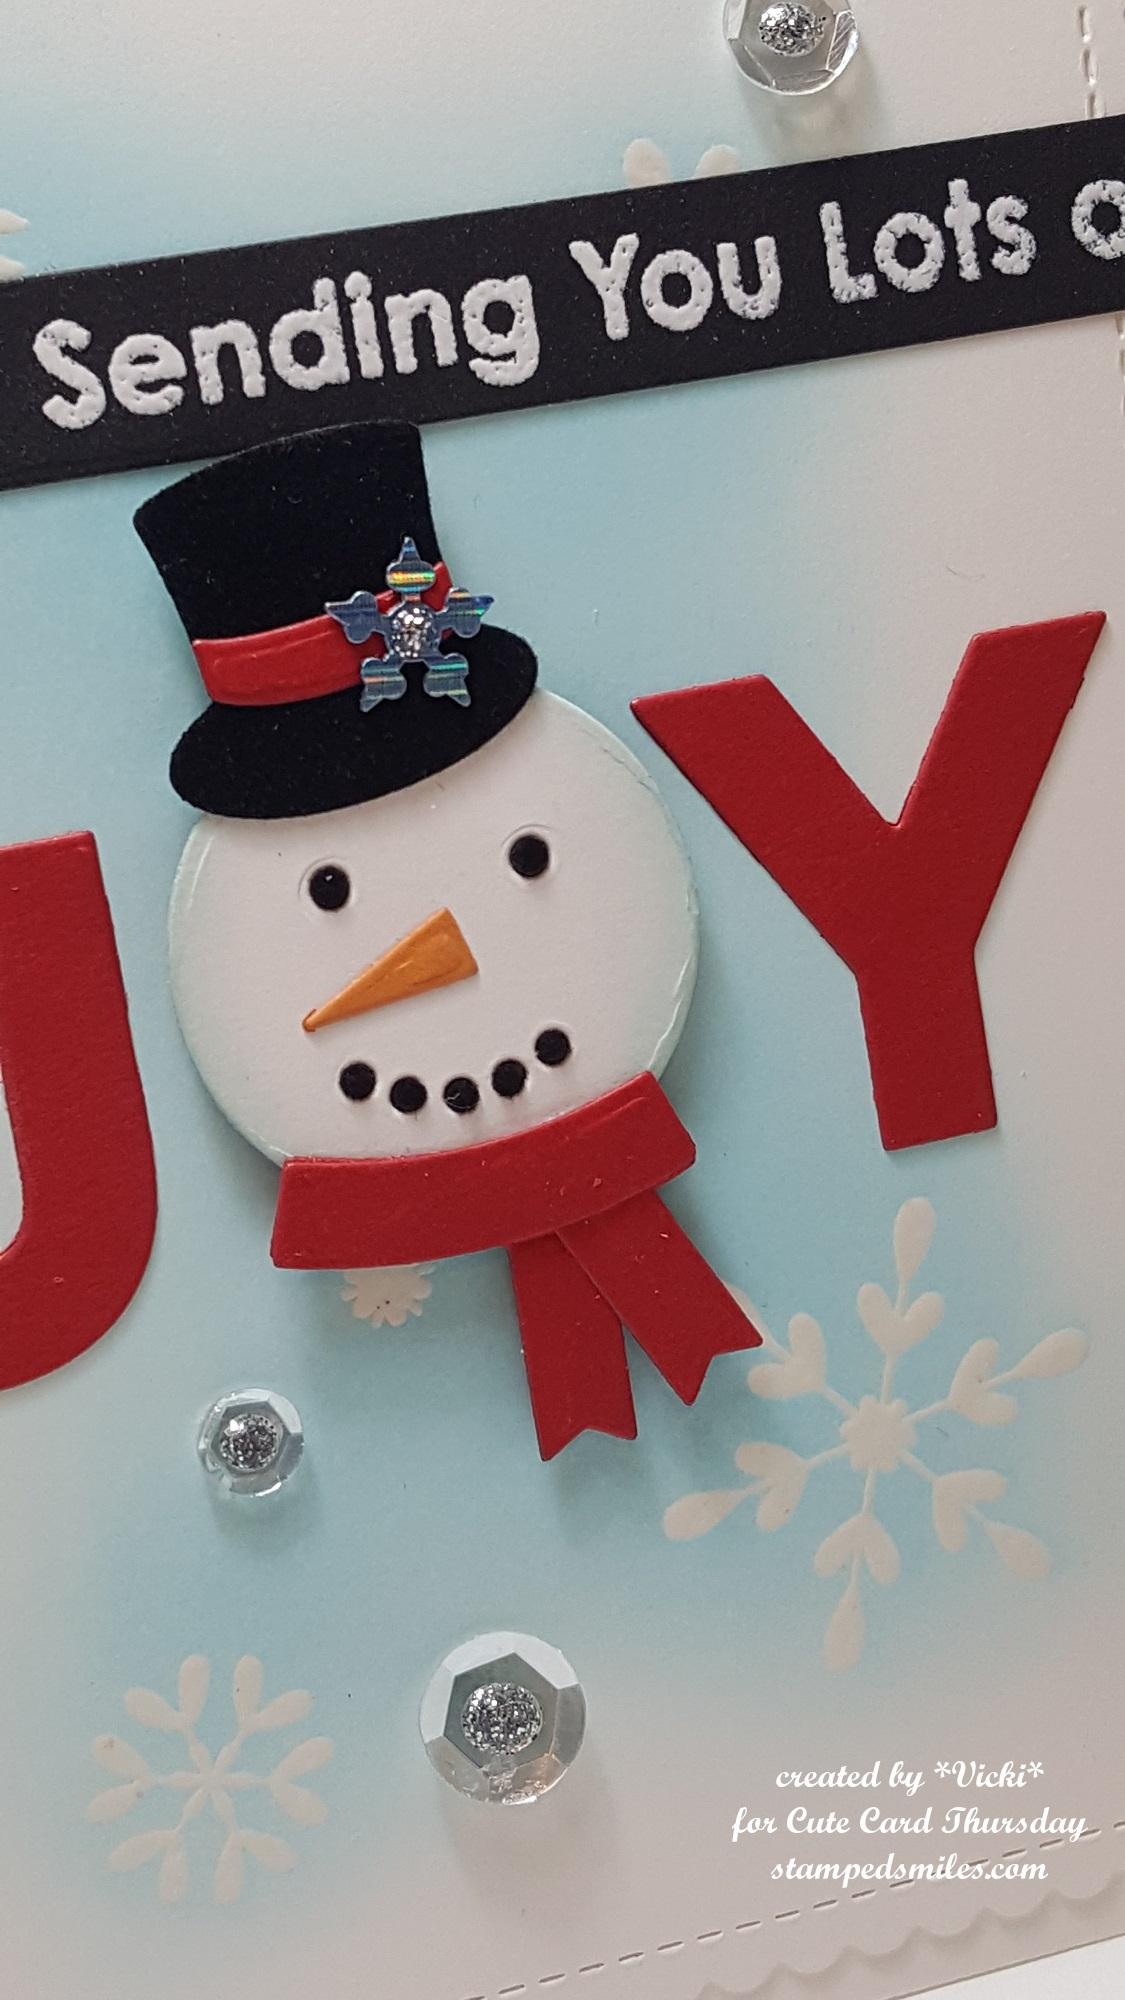 Vicki-CCT561-Snowman Joy-close